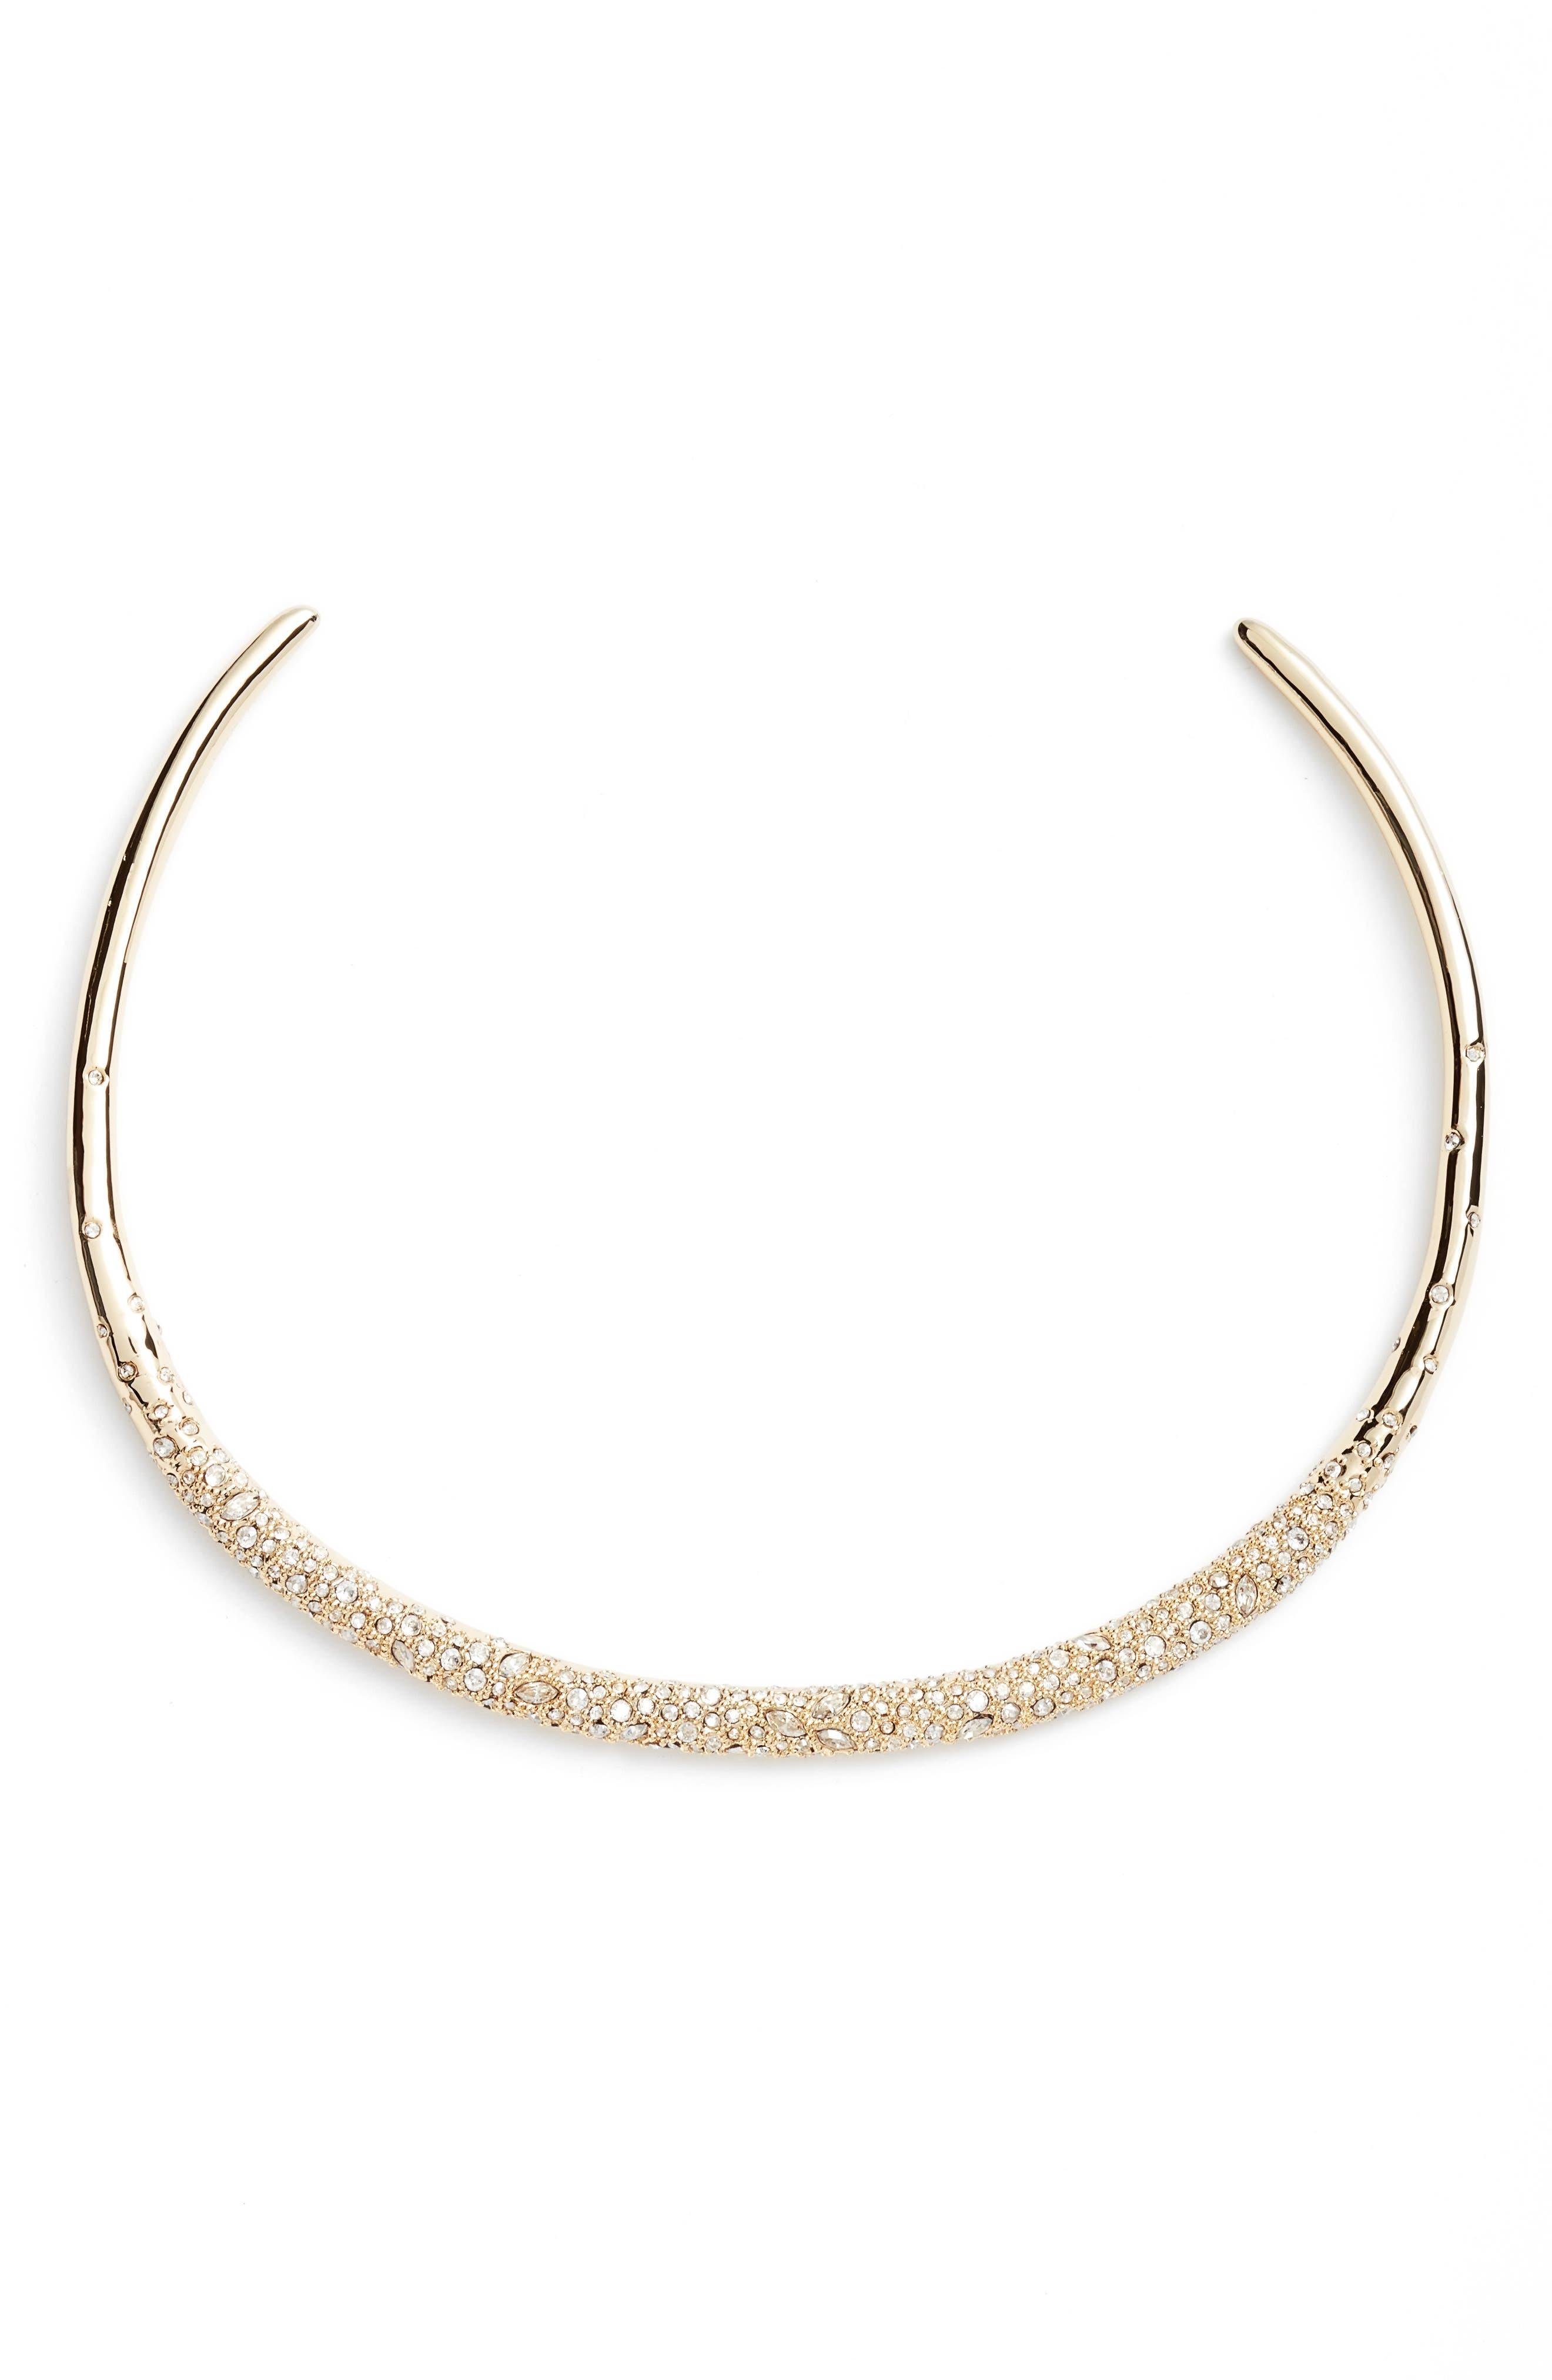 Alexis Bittar Thin Encrusted Collar Necklace